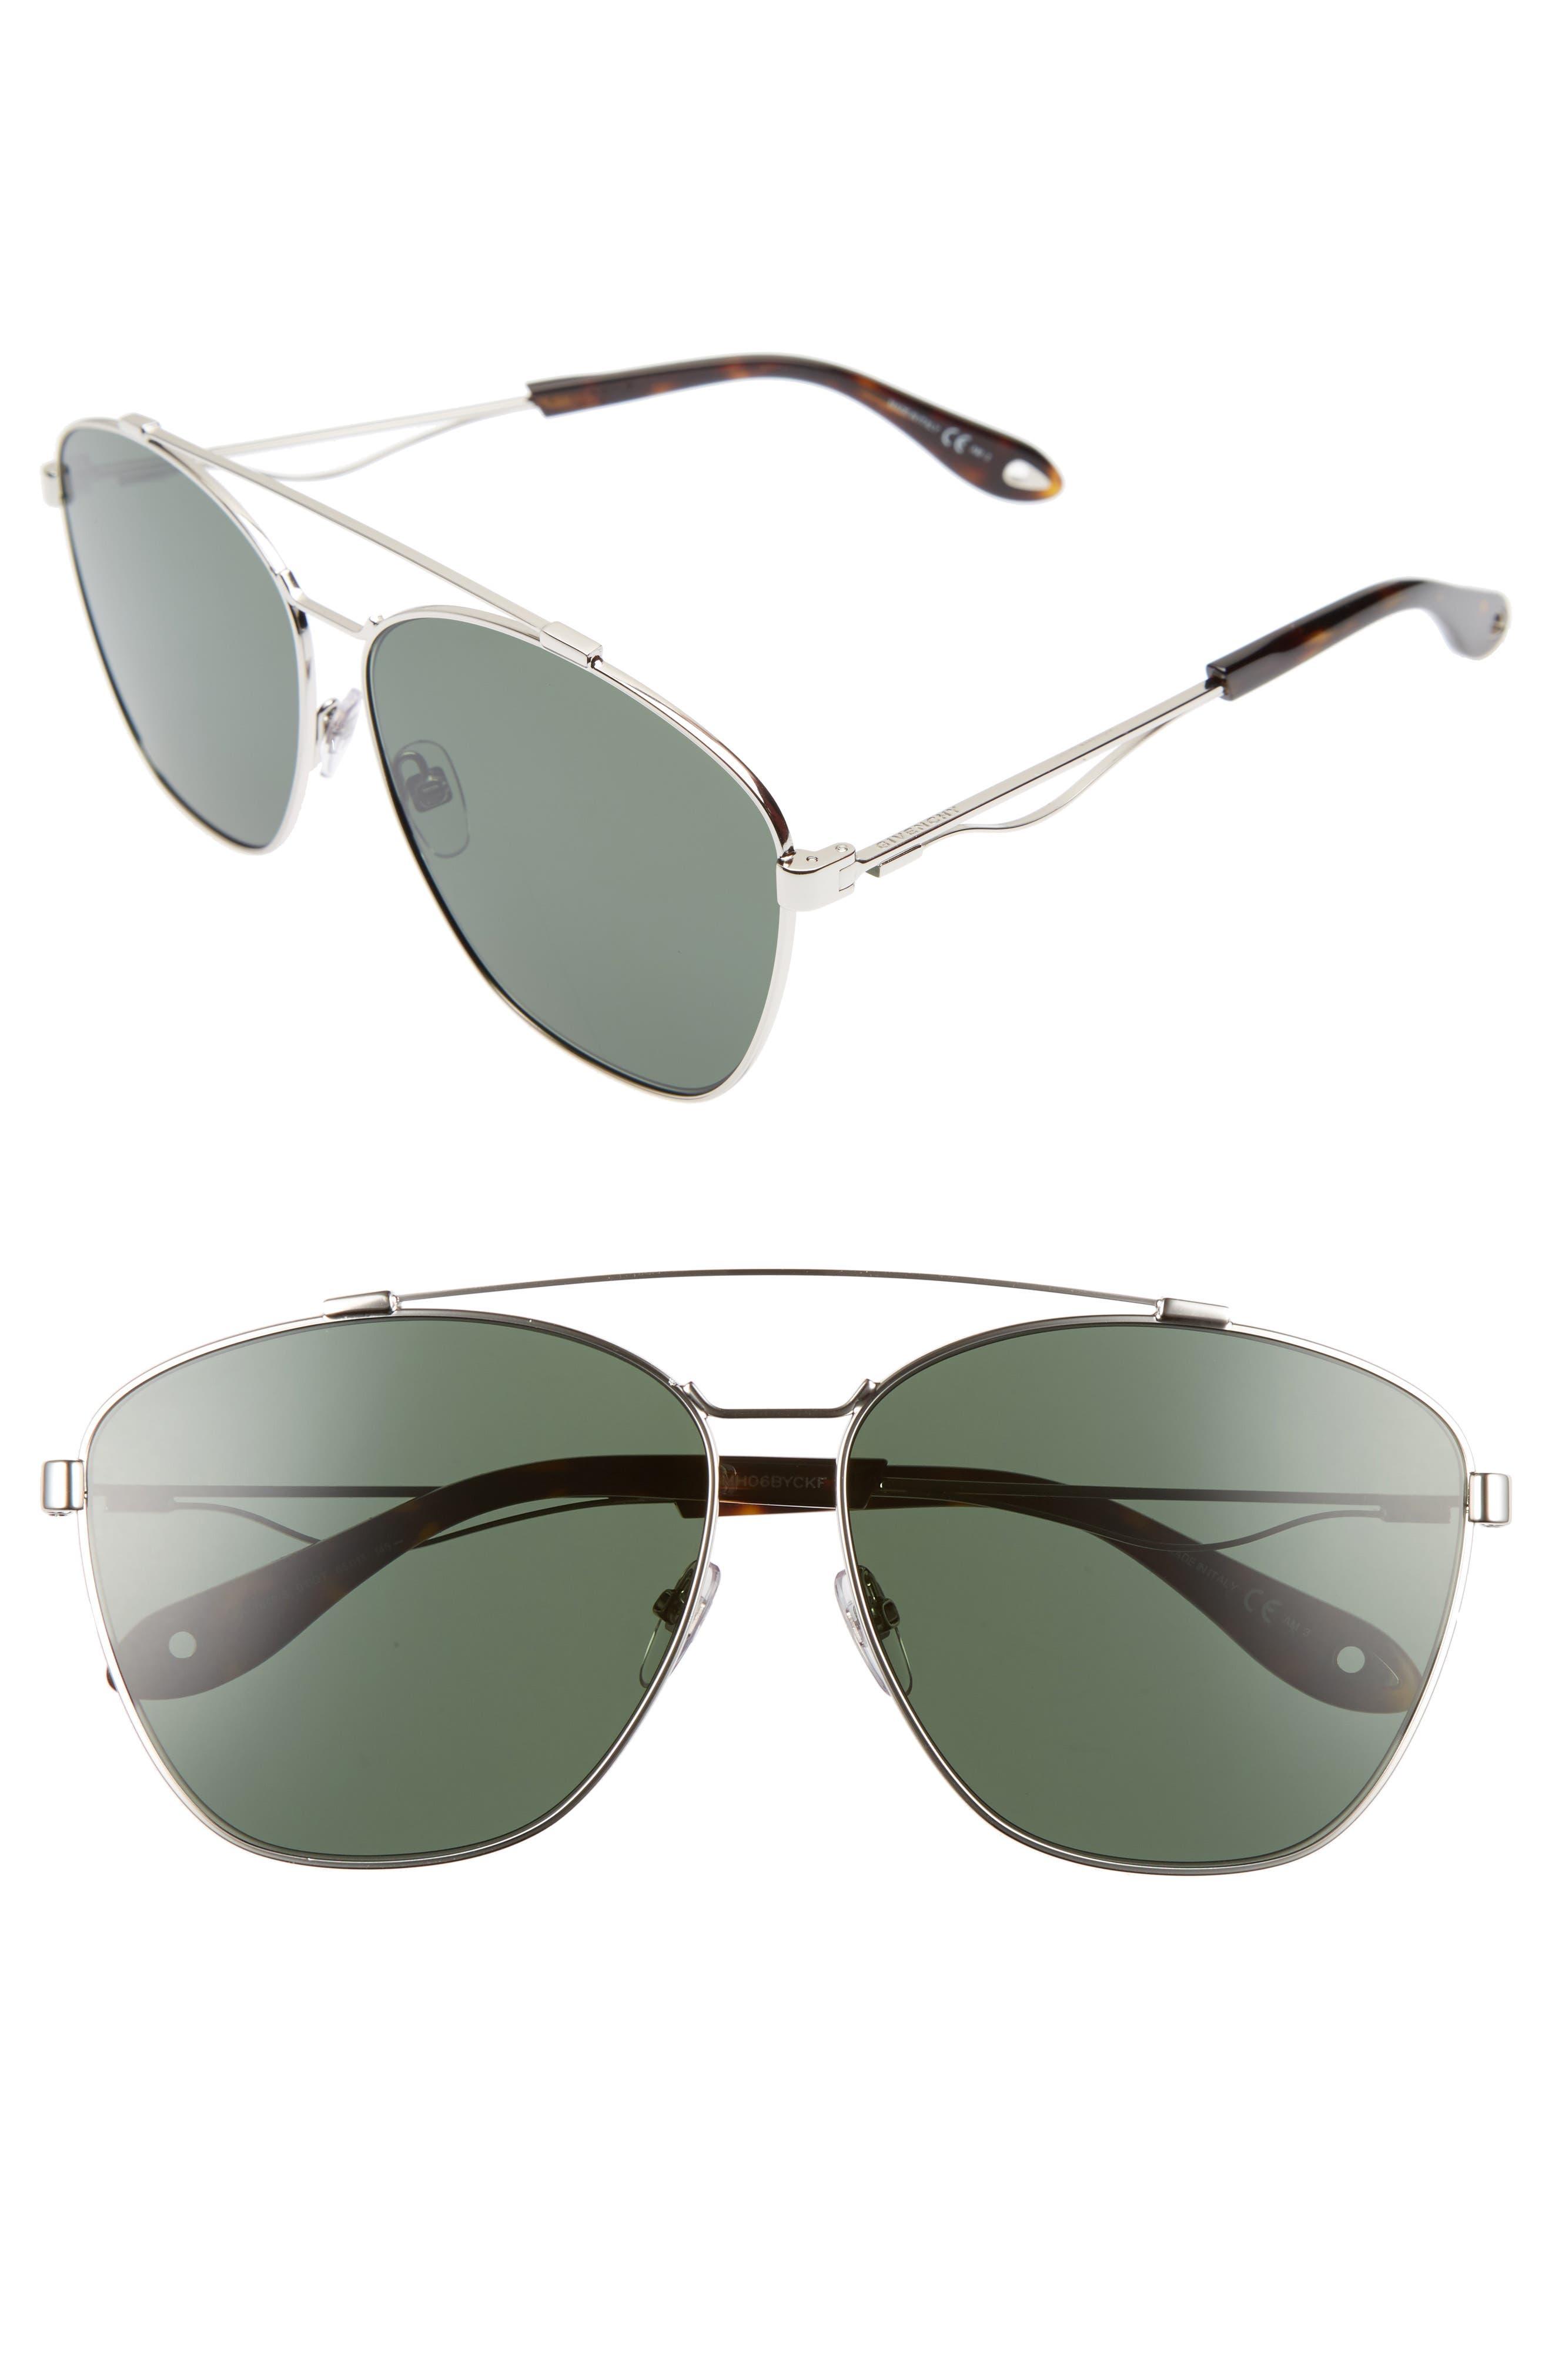 65mm Round Aviator Sunglasses,                         Main,                         color, Palladium